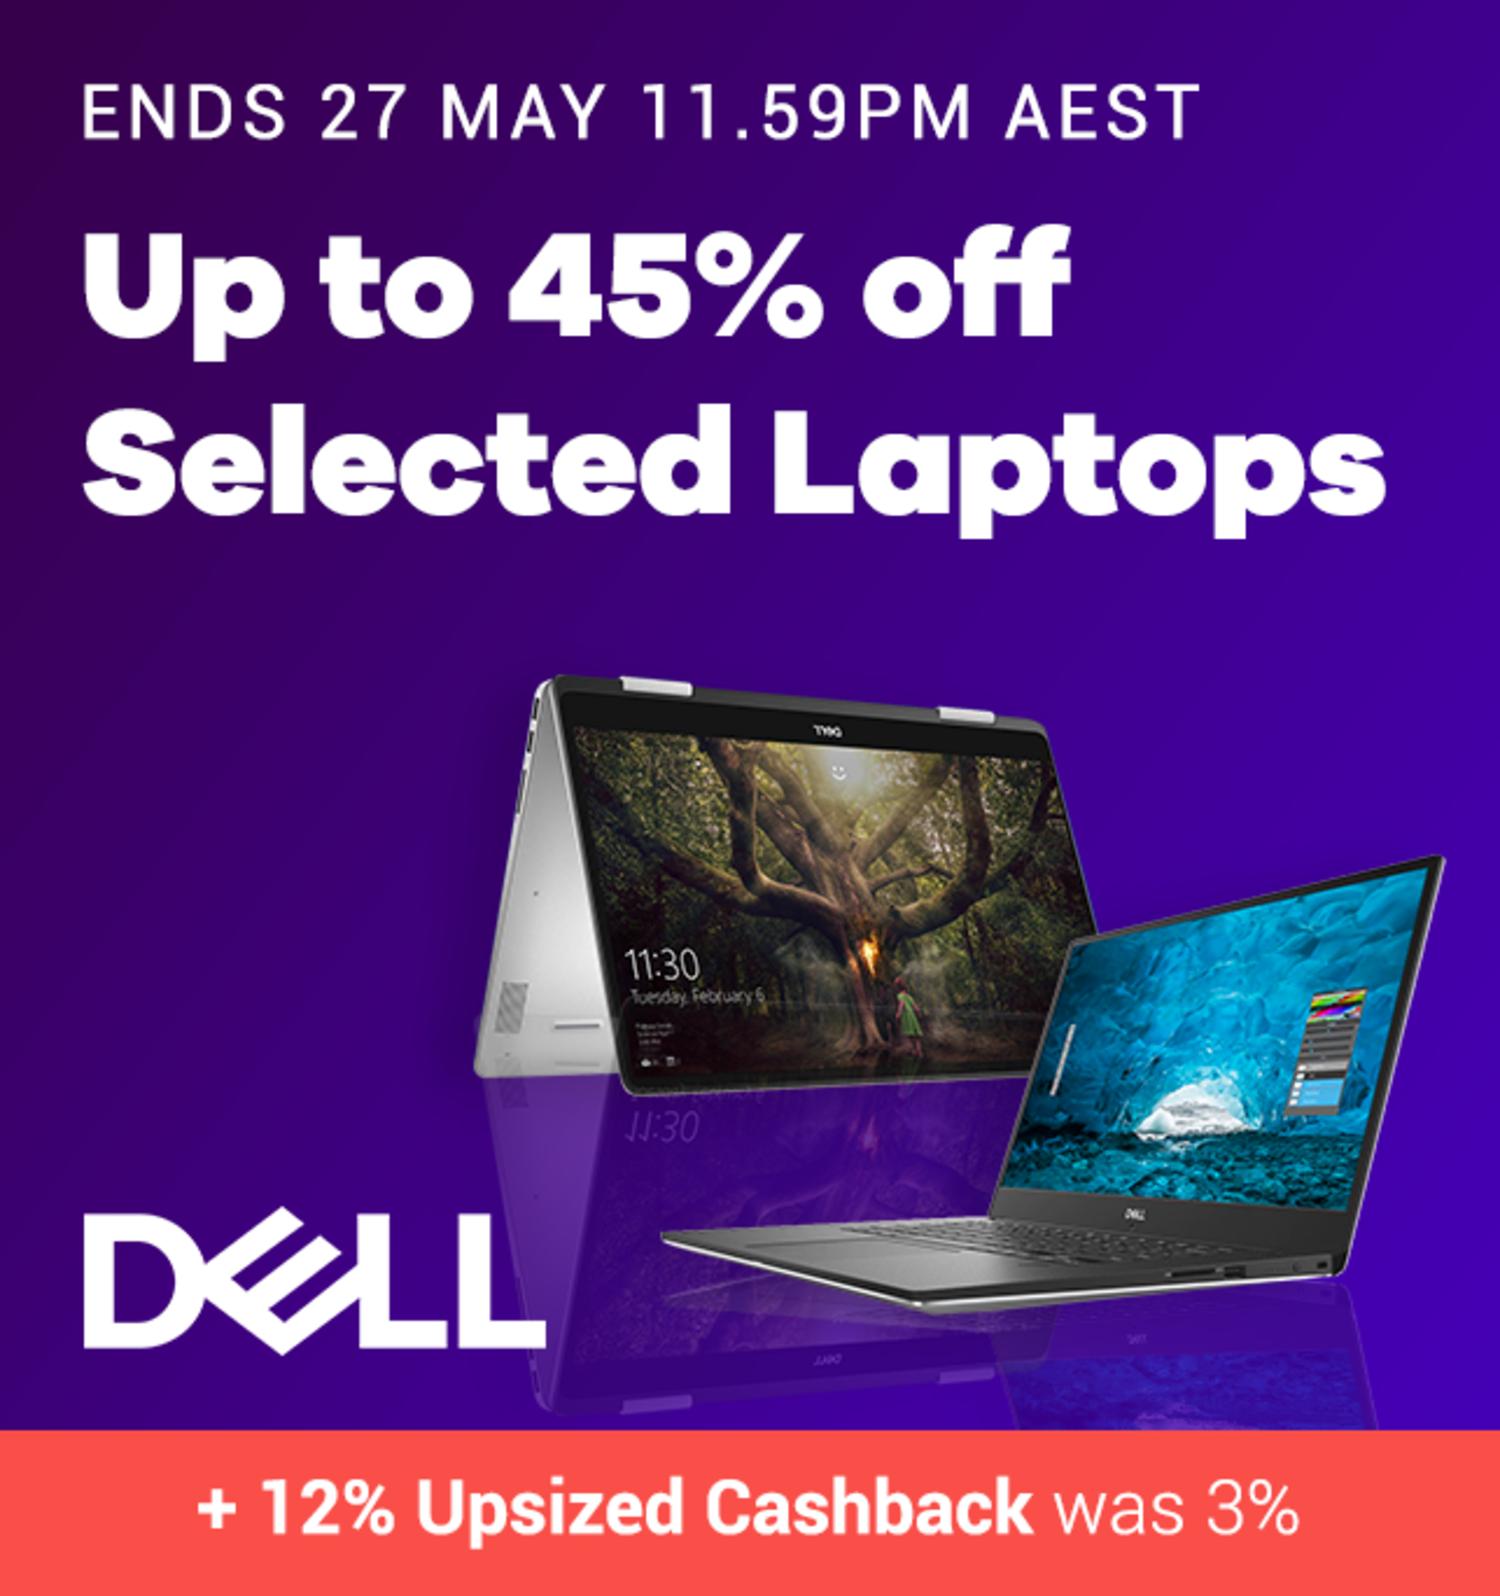 Dell - 12% Upsized Cashback